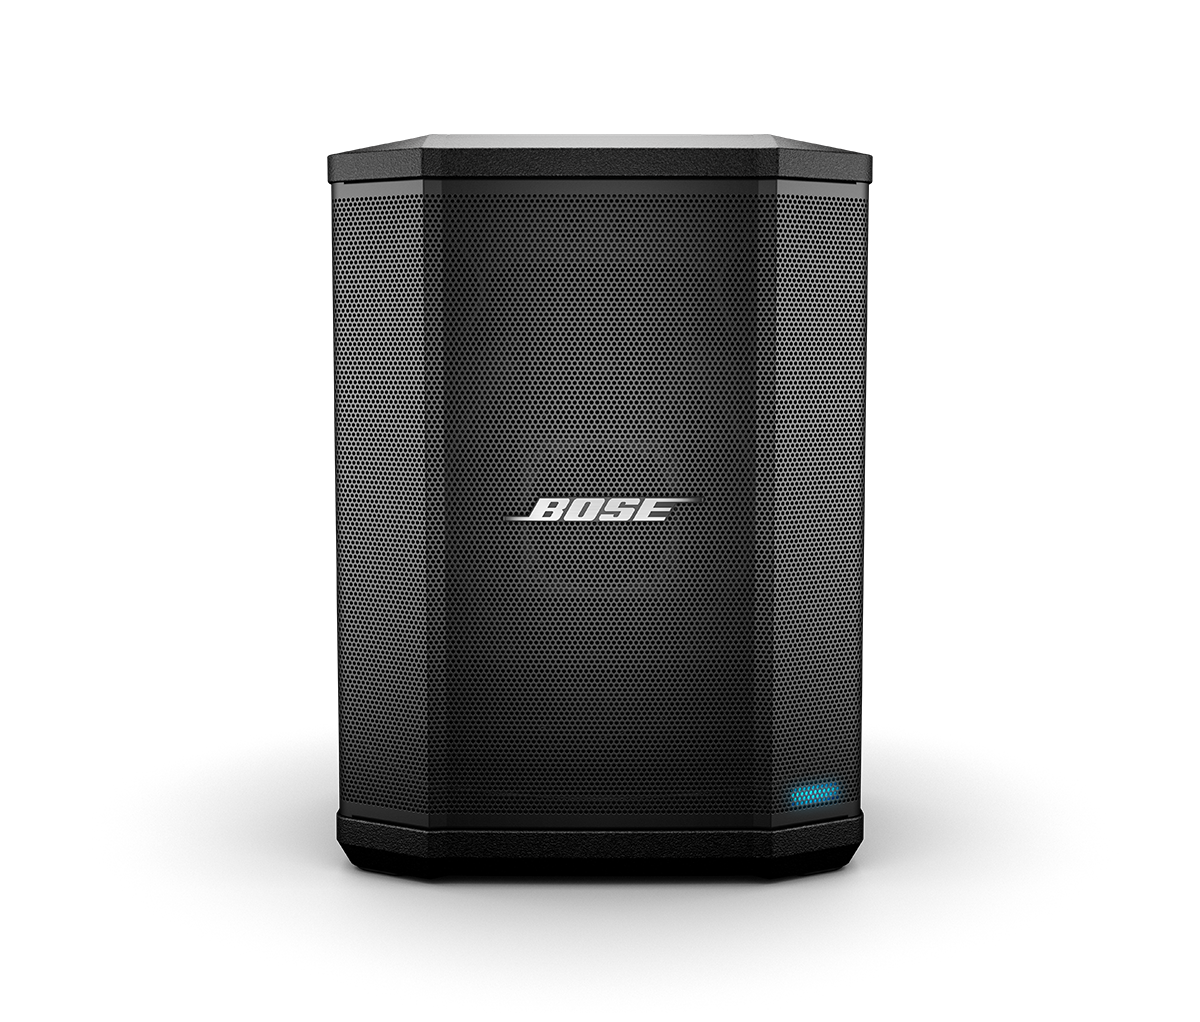 Bose_S1_Pro_system